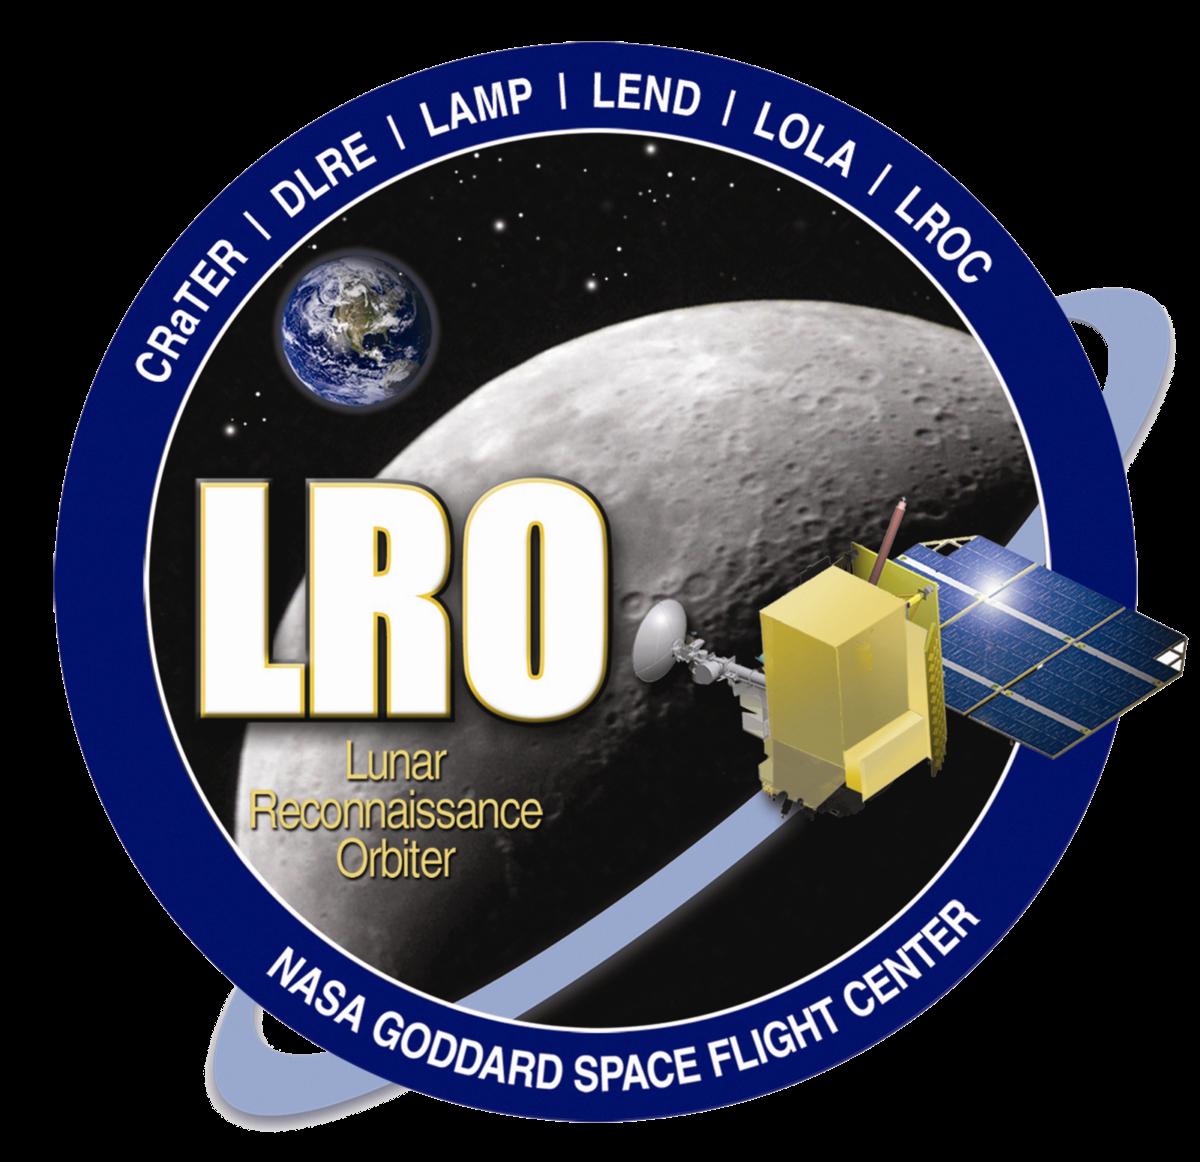 LRO (Lunar Reconnaissance Orbiter) - Page 18 1200px-LRO_mission_logo%28transparent_background%29_01